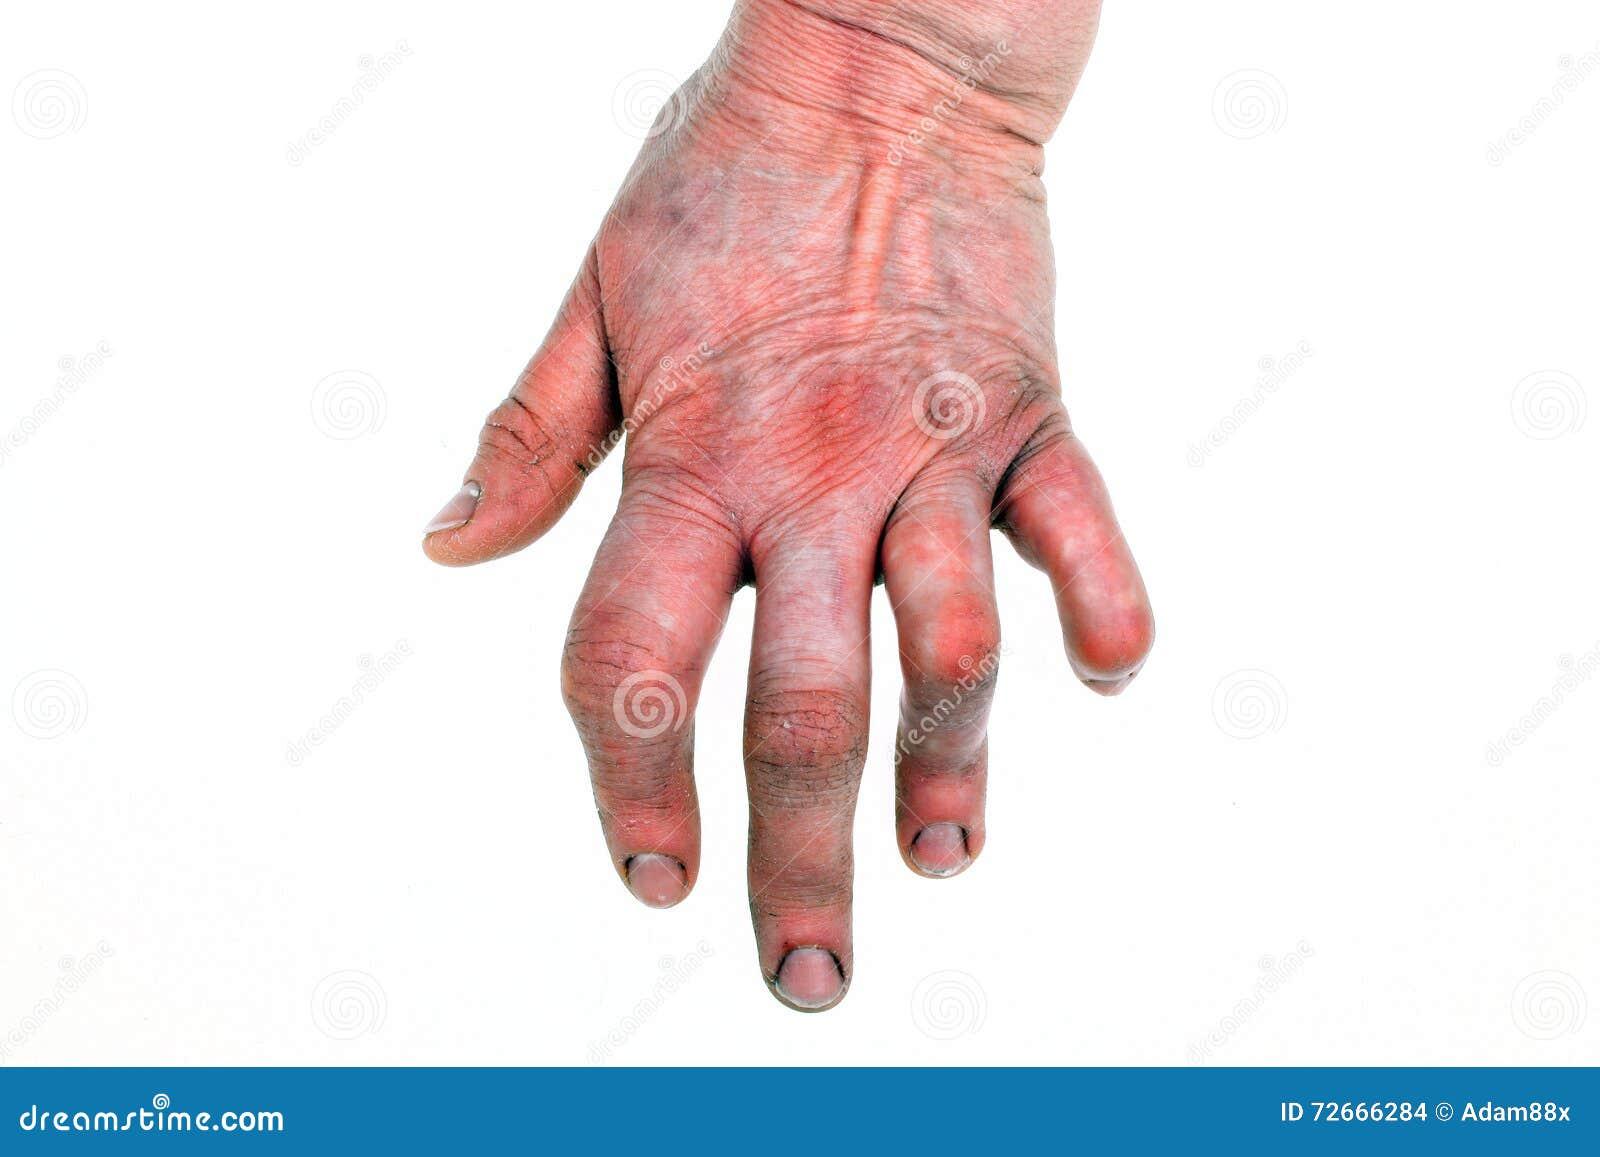 Artritis Reumatoide Foto De Archivo Imagen De Artritis 72666284